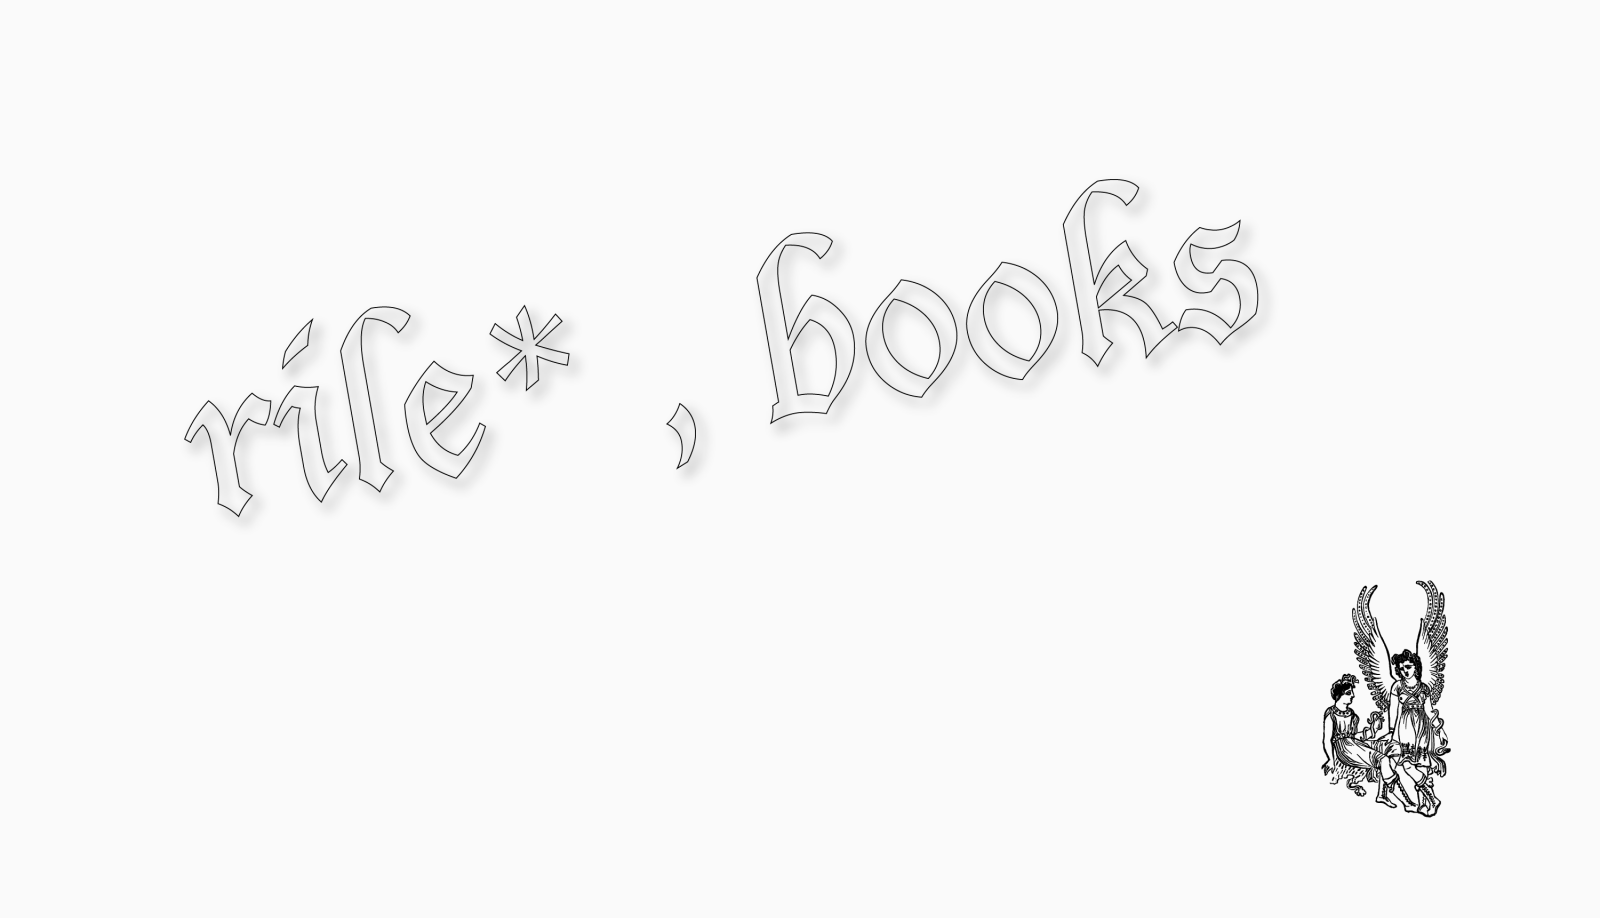 rile*, books